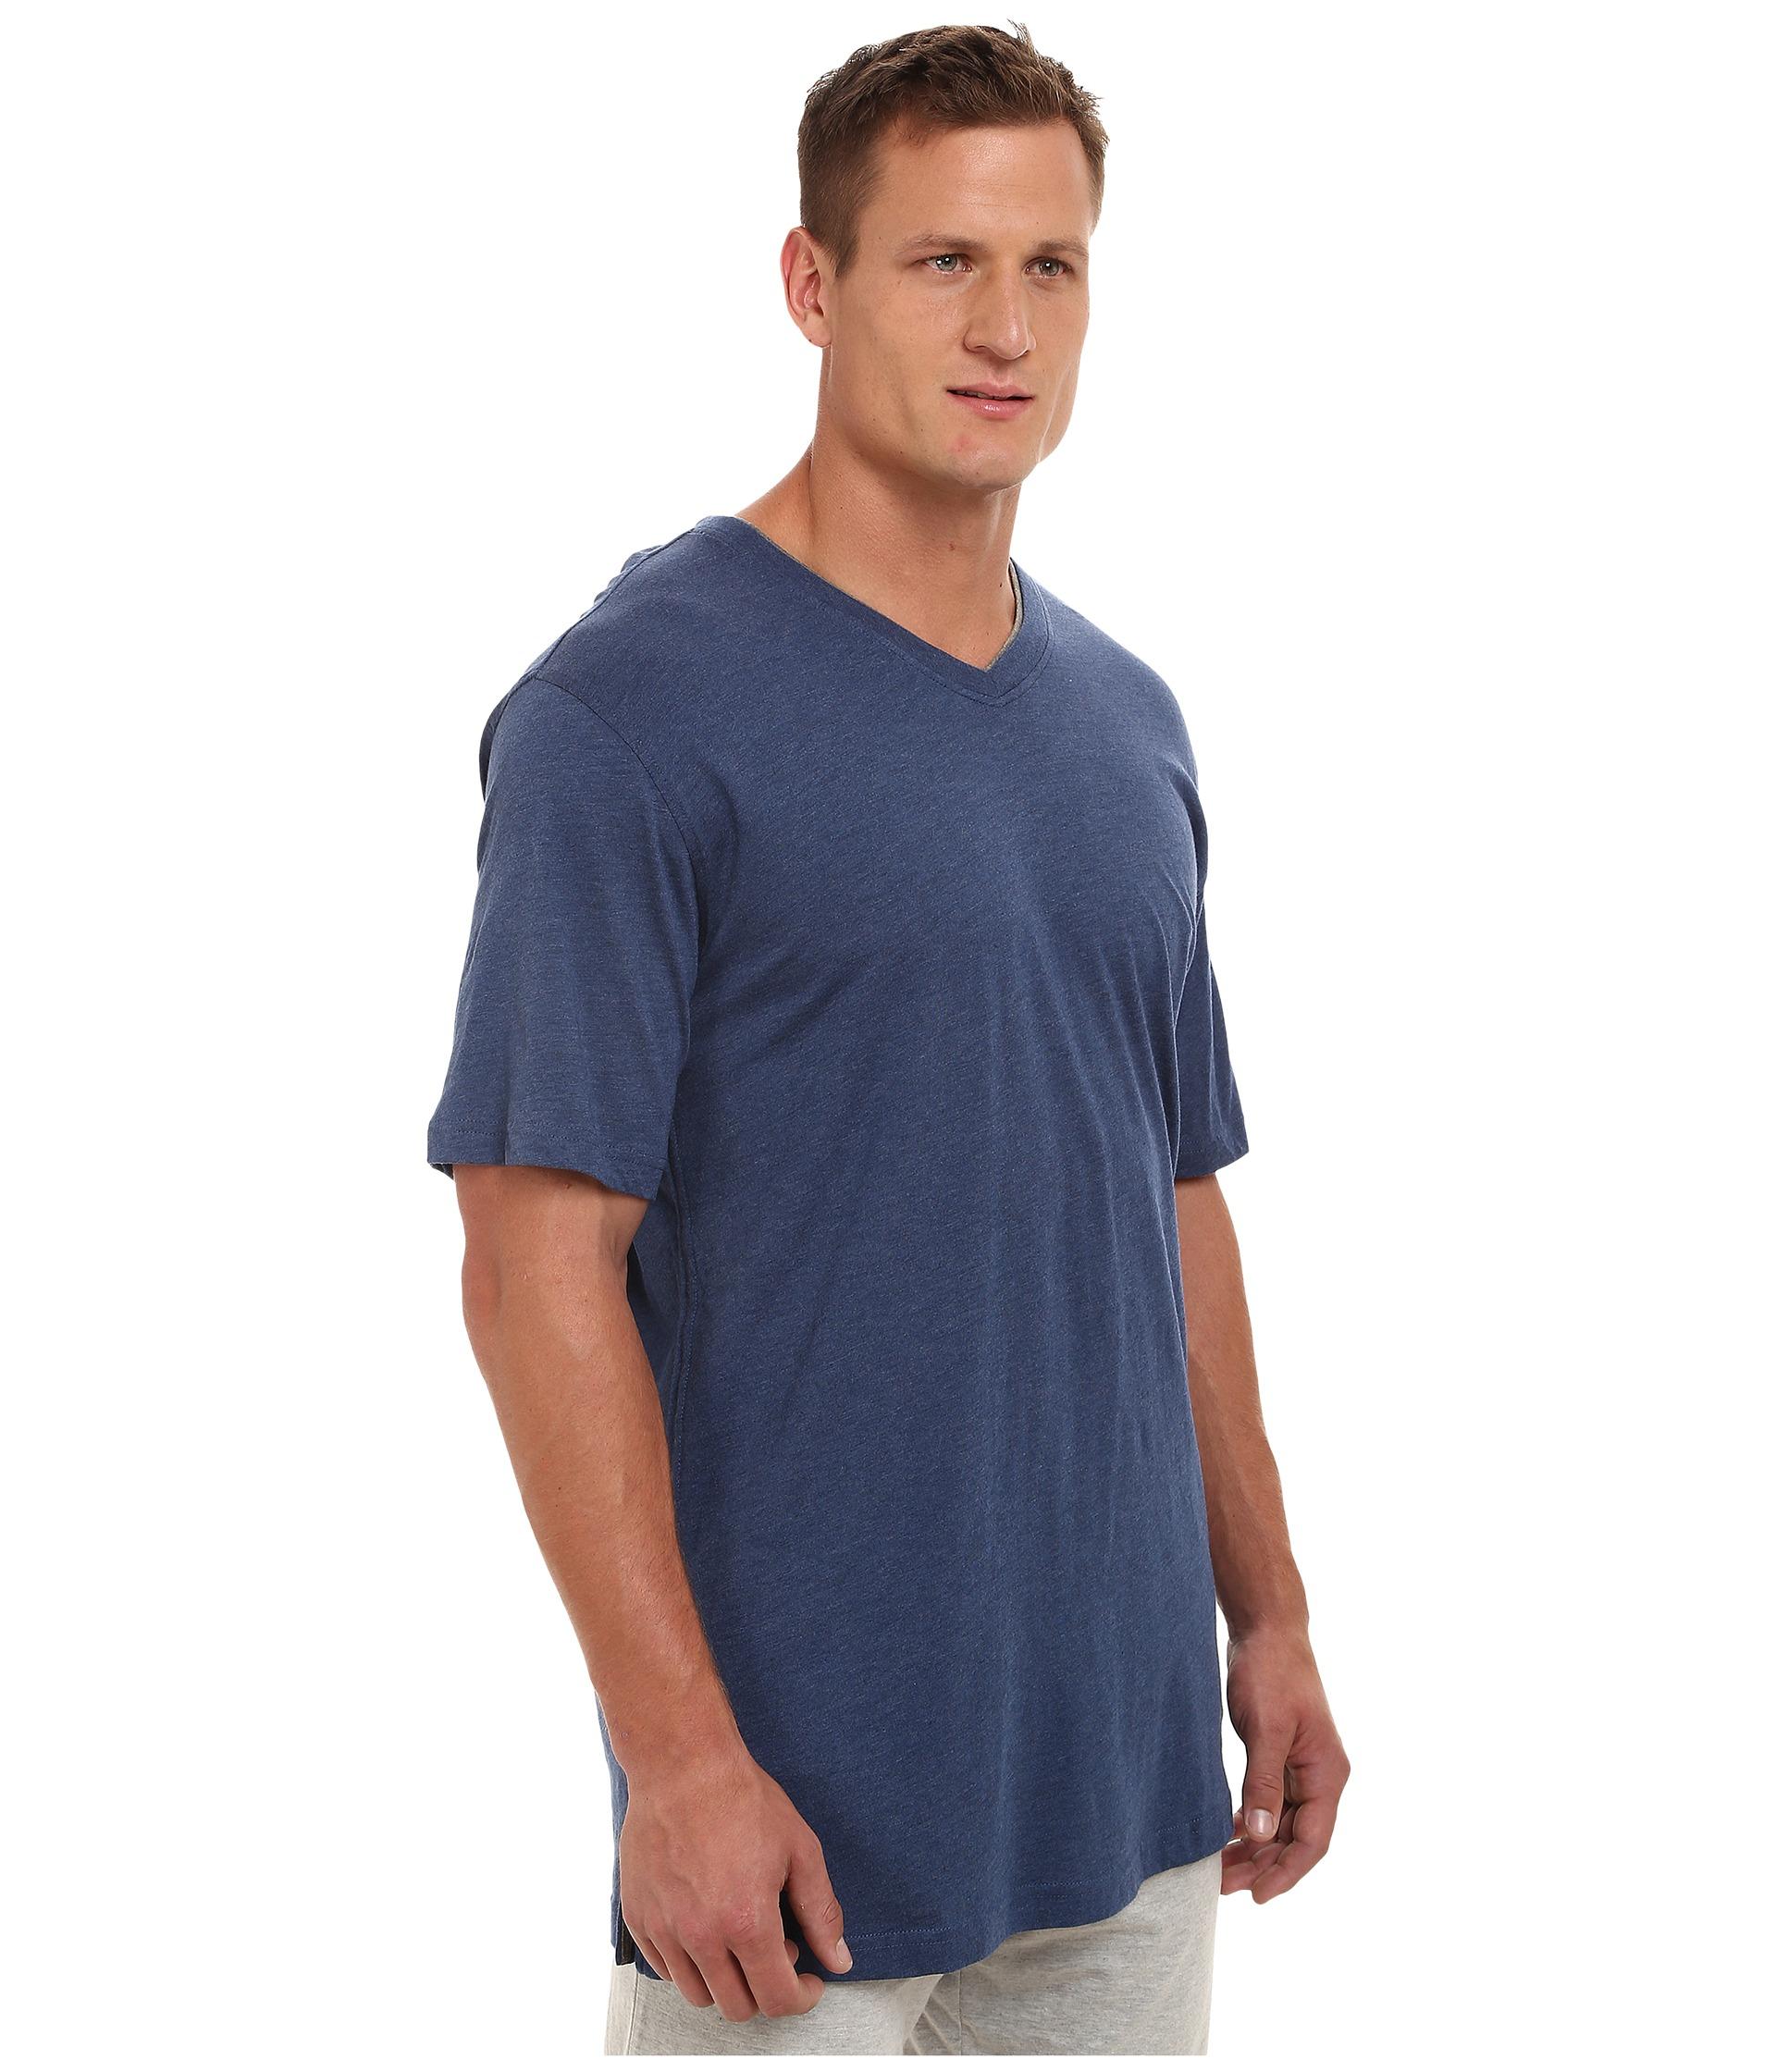 Tommy bahama big tall heather cotton modal jersey knit v for Custom tommy bahama shirts